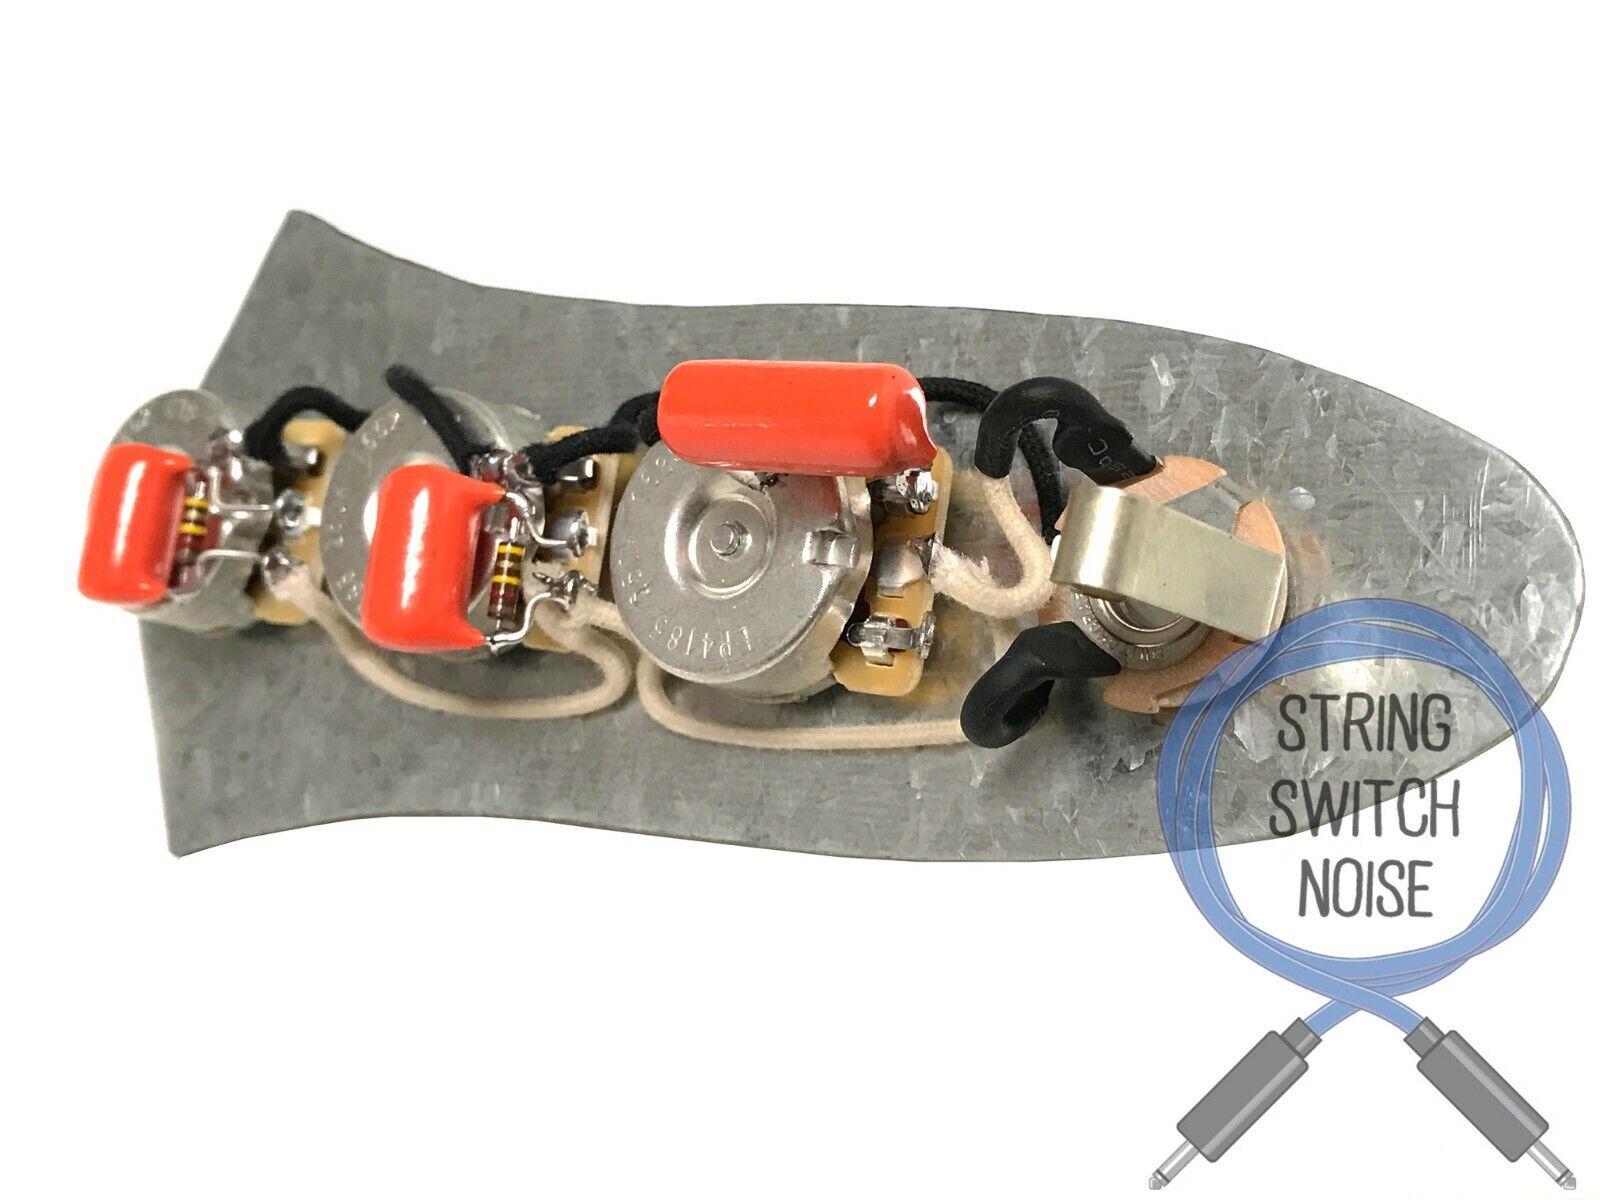 (Fender) Jazz Bass Wiring Harness, Treble Bleed, No Load Tone, Upgrade